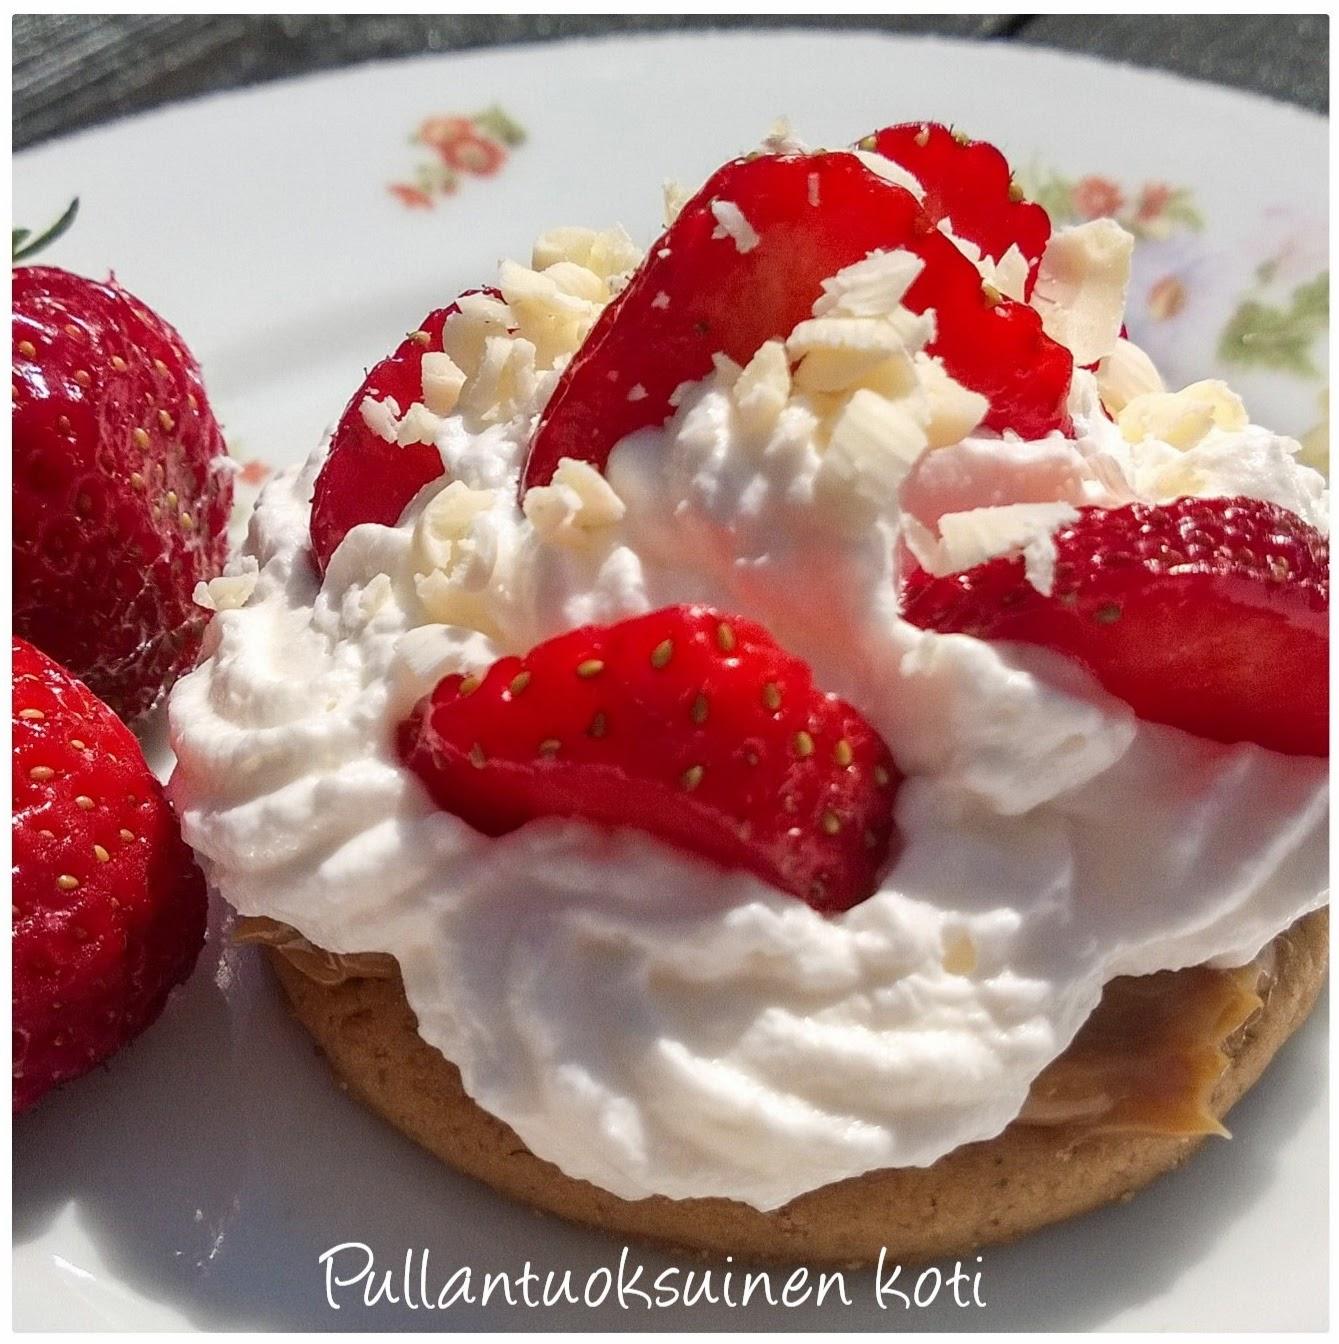 www.pullantuoksuinenkoti.com